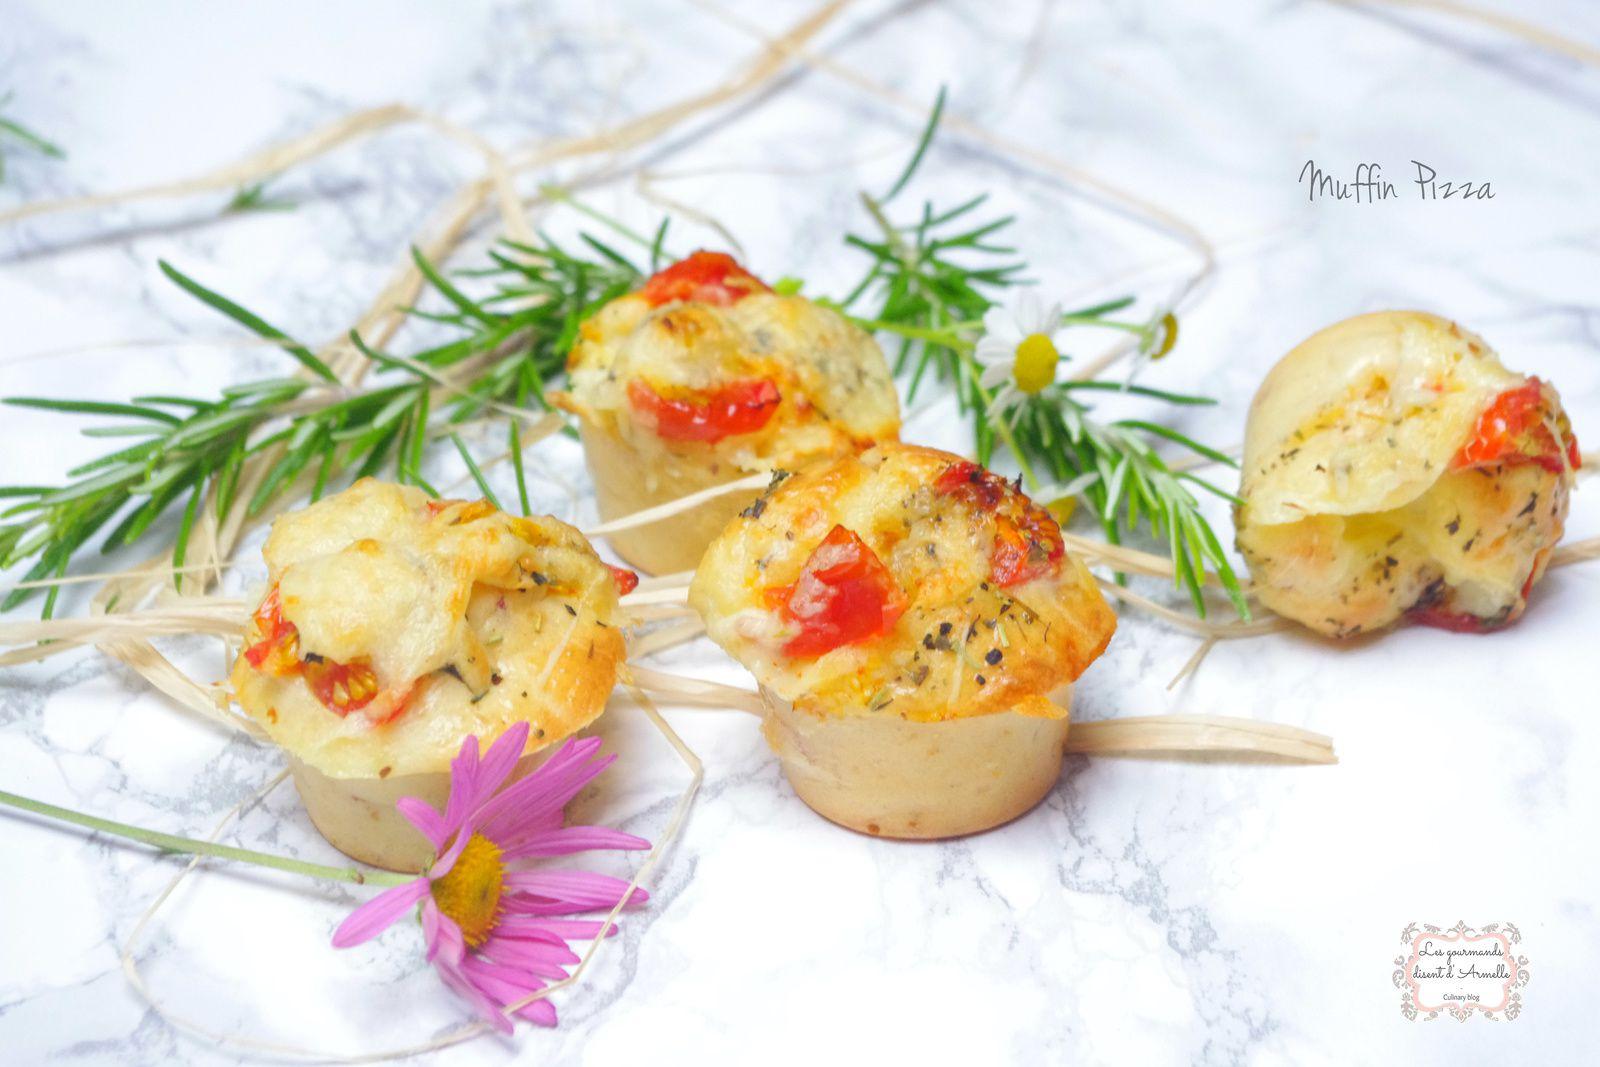   Muffin pizza   © Les Gourmands {disent} d'Armelle